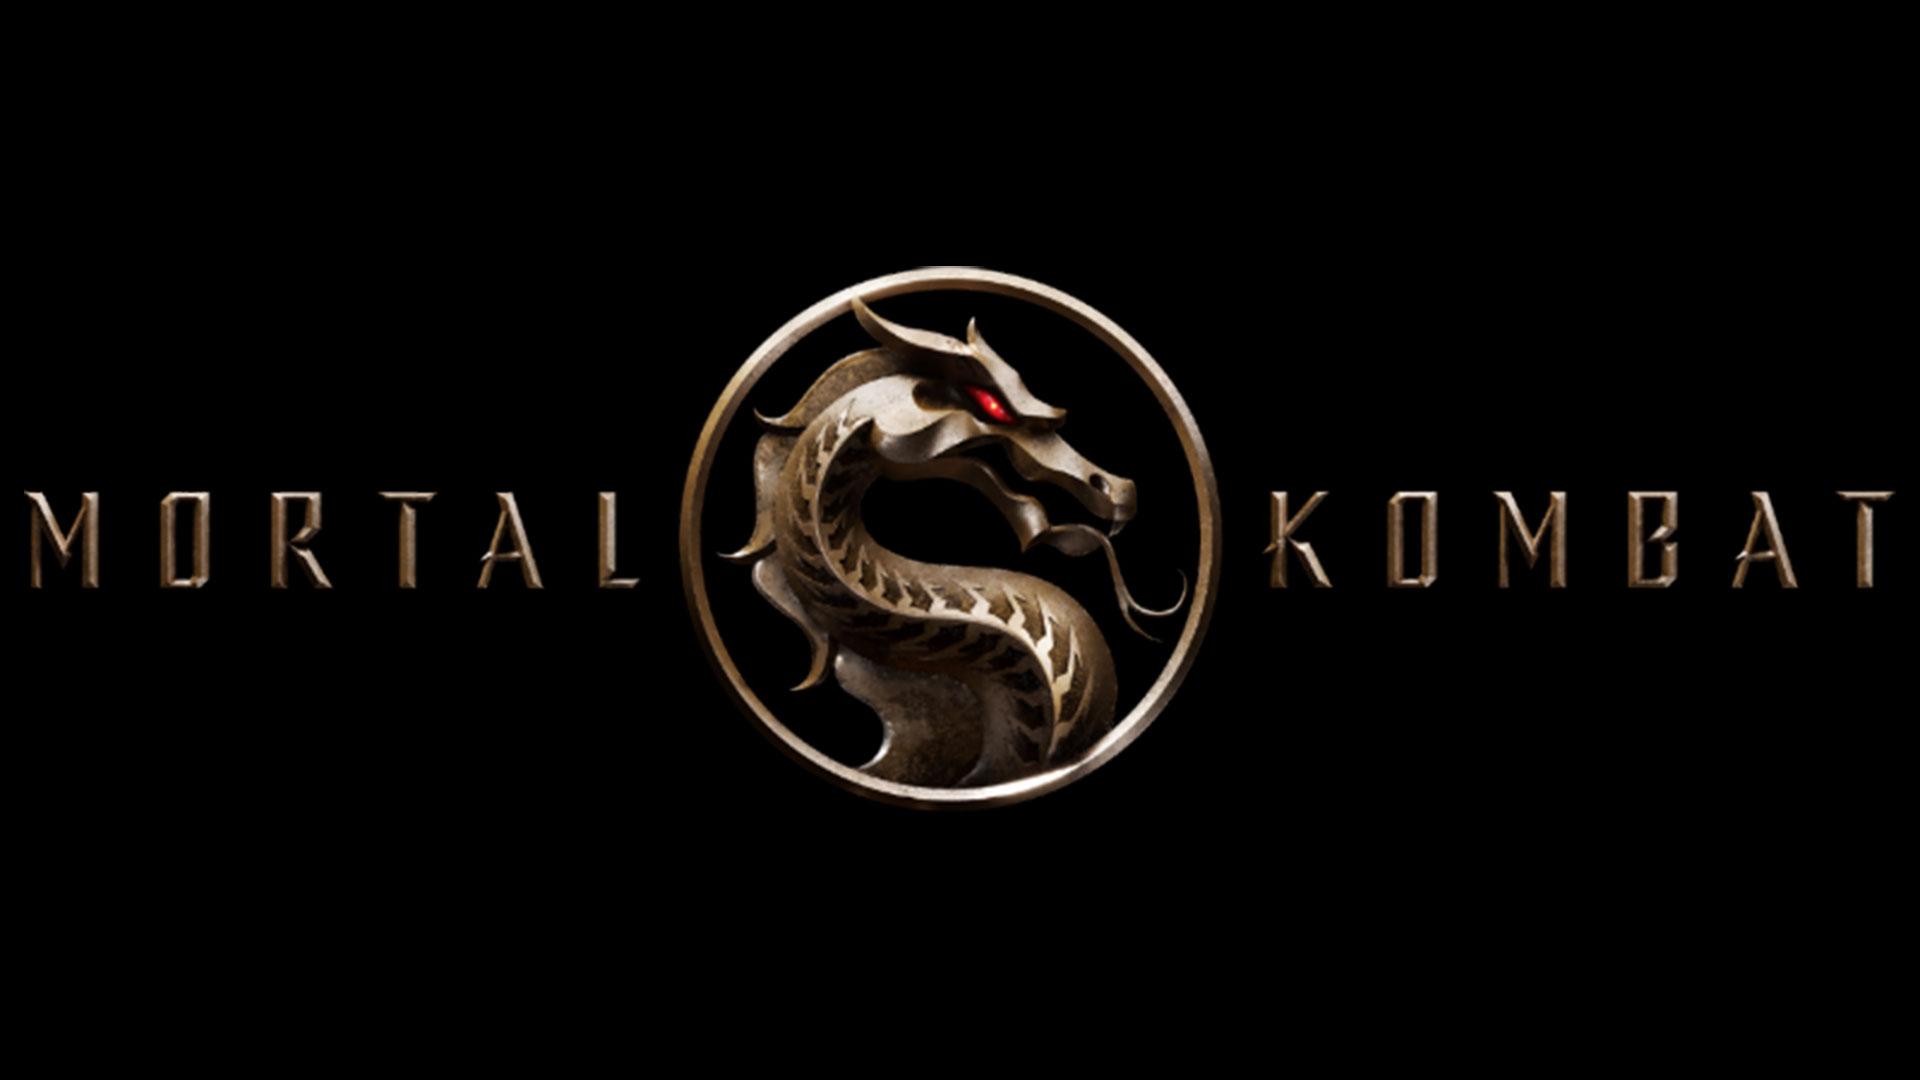 FanTracks Mortal Kombat (2021) audio commentary